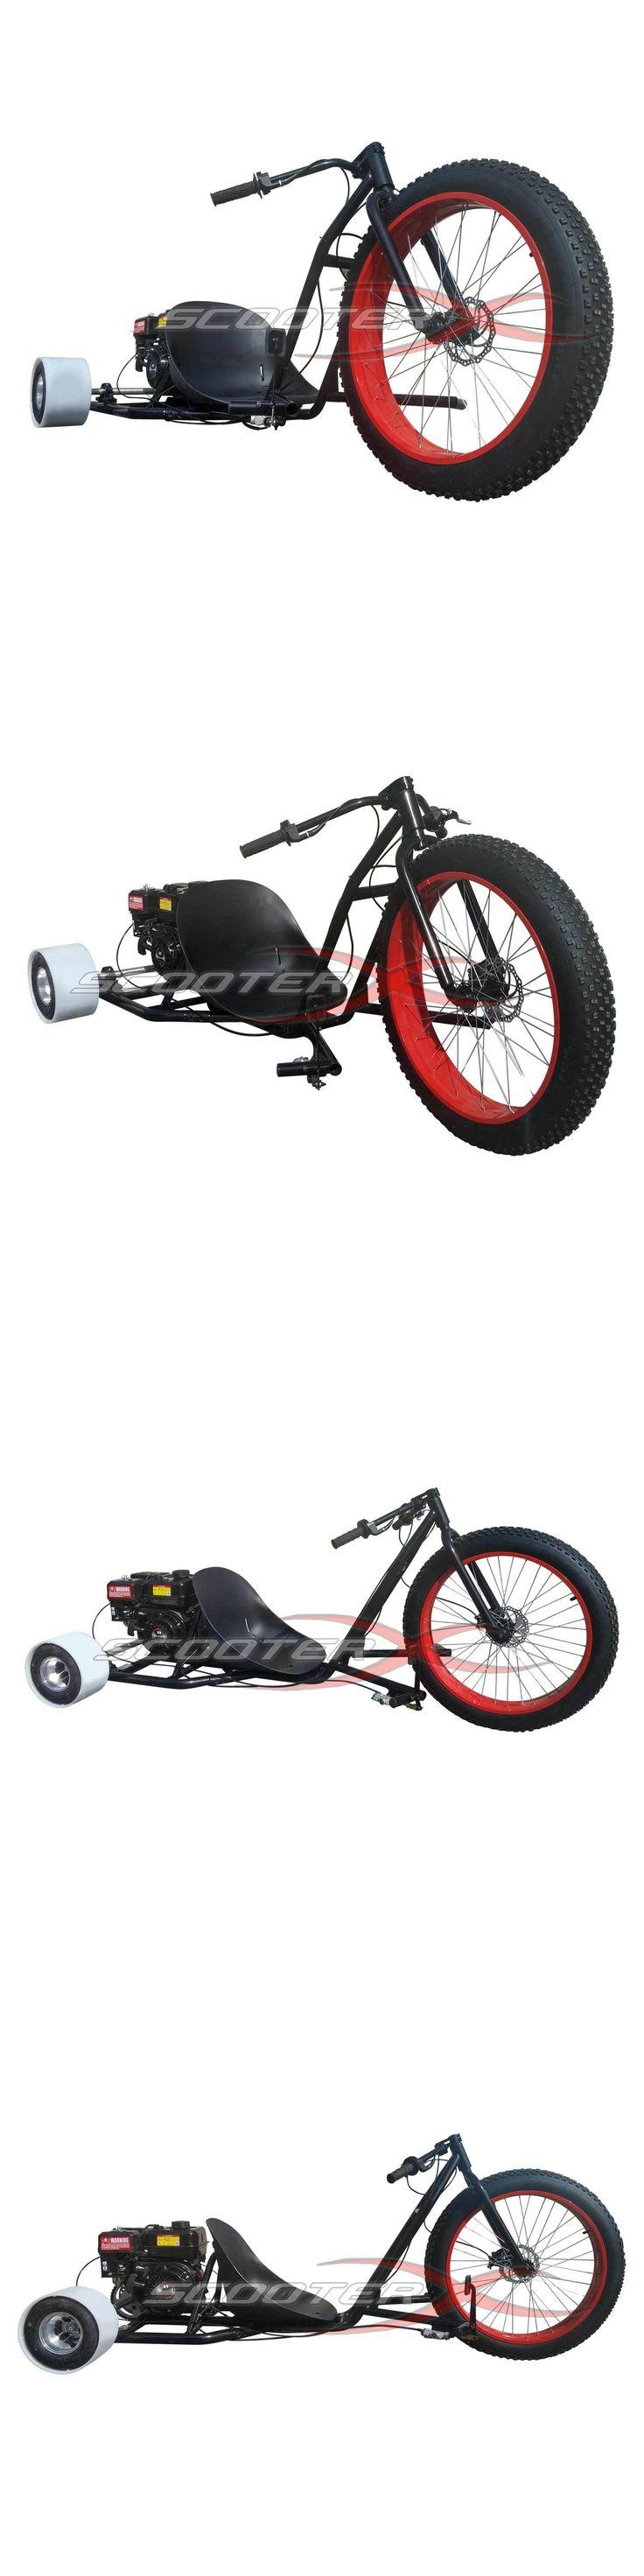 Gas Scooters 75211: Gas Powered Drift Trike 6.5Hp Engine Motorized Big Wheel 3 Wheeler Drift Kart -> BUY IT NOW ONLY: $949.96 on eBay!